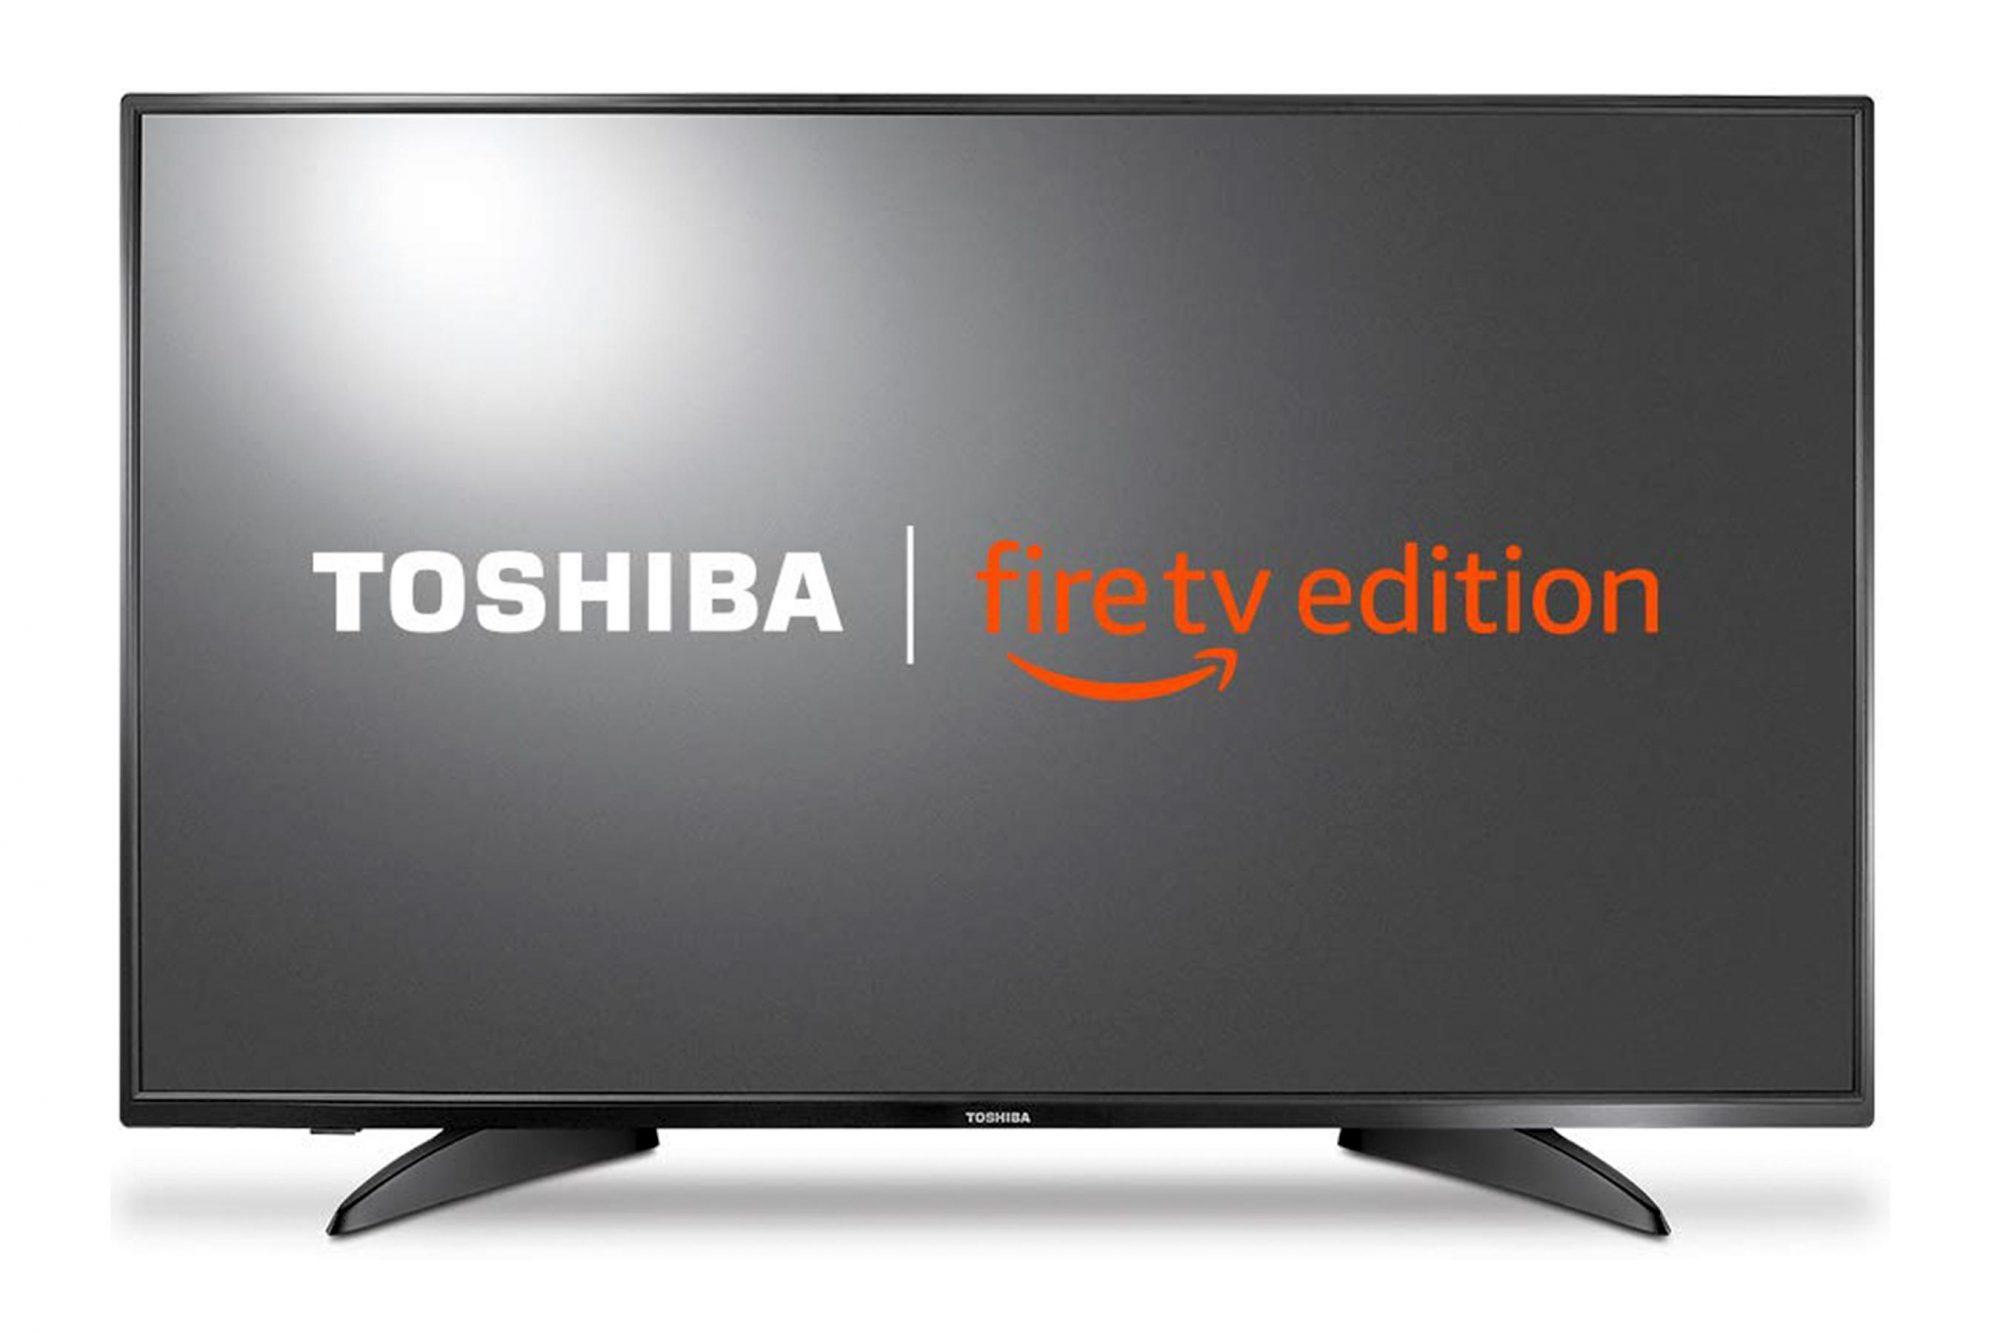 Toshiba 43LF421U19 43-inch 1080p Full HD Smart LED TV - Fire TV Edition CR: Amazon